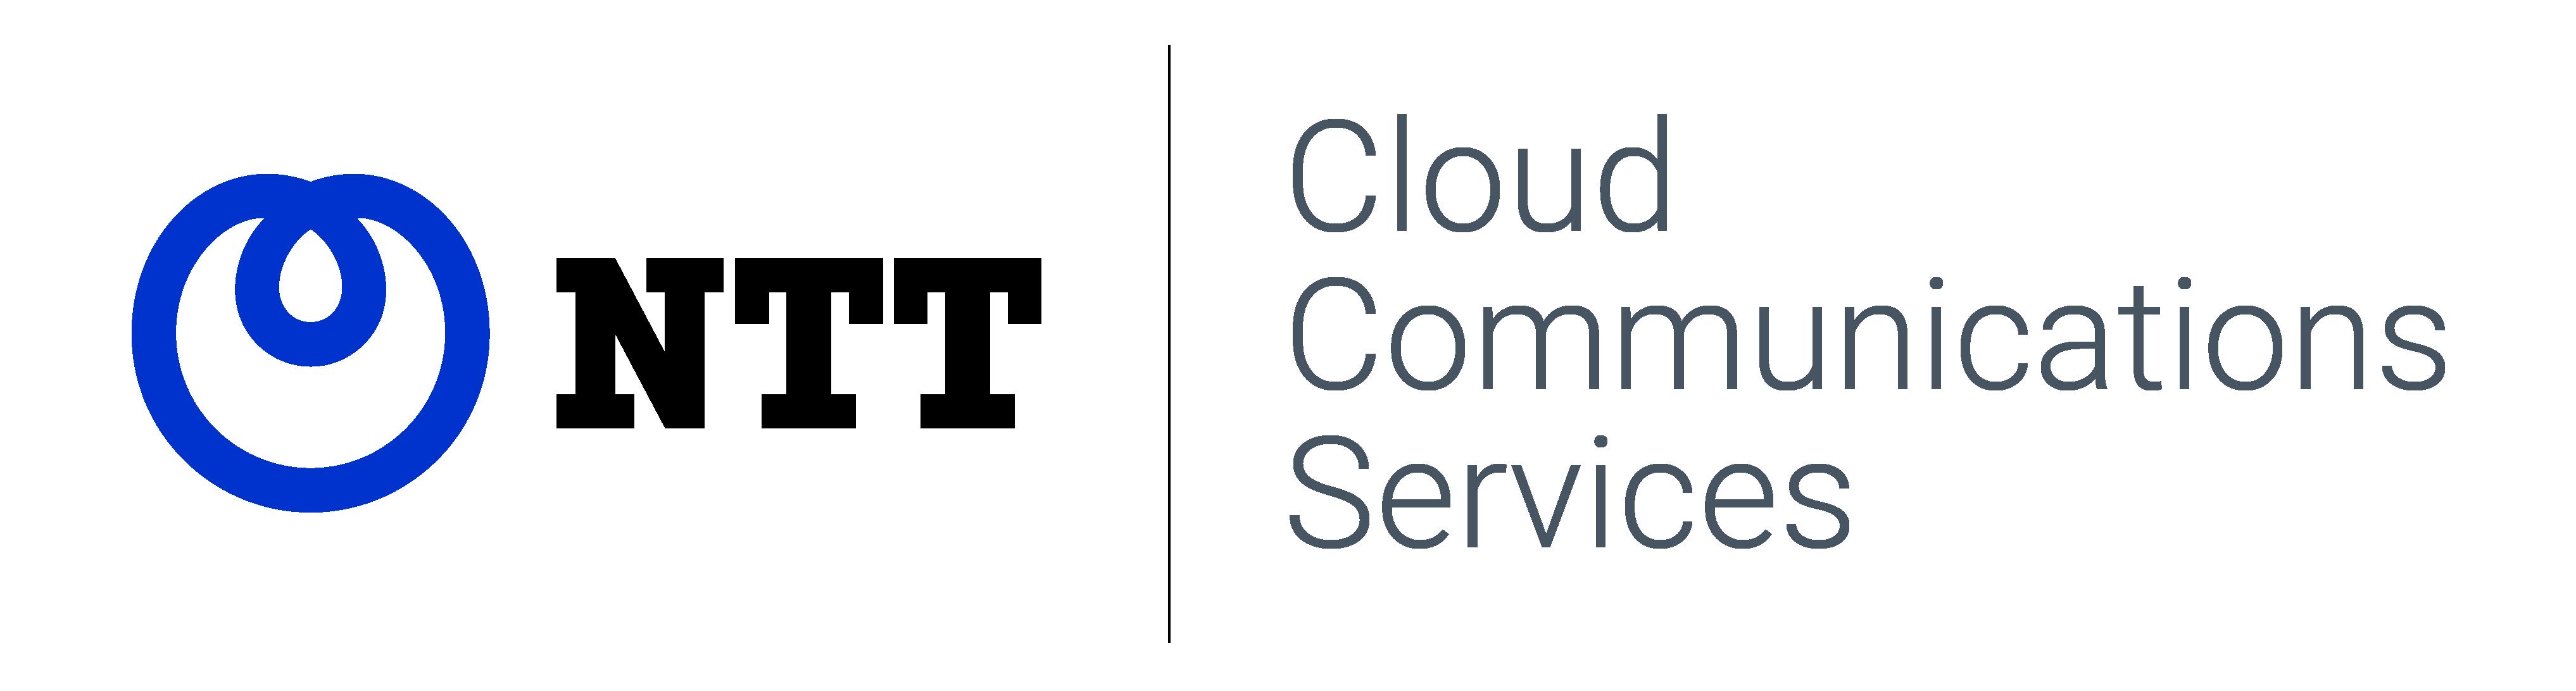 Arkadin Corporate - Collaboration Services -